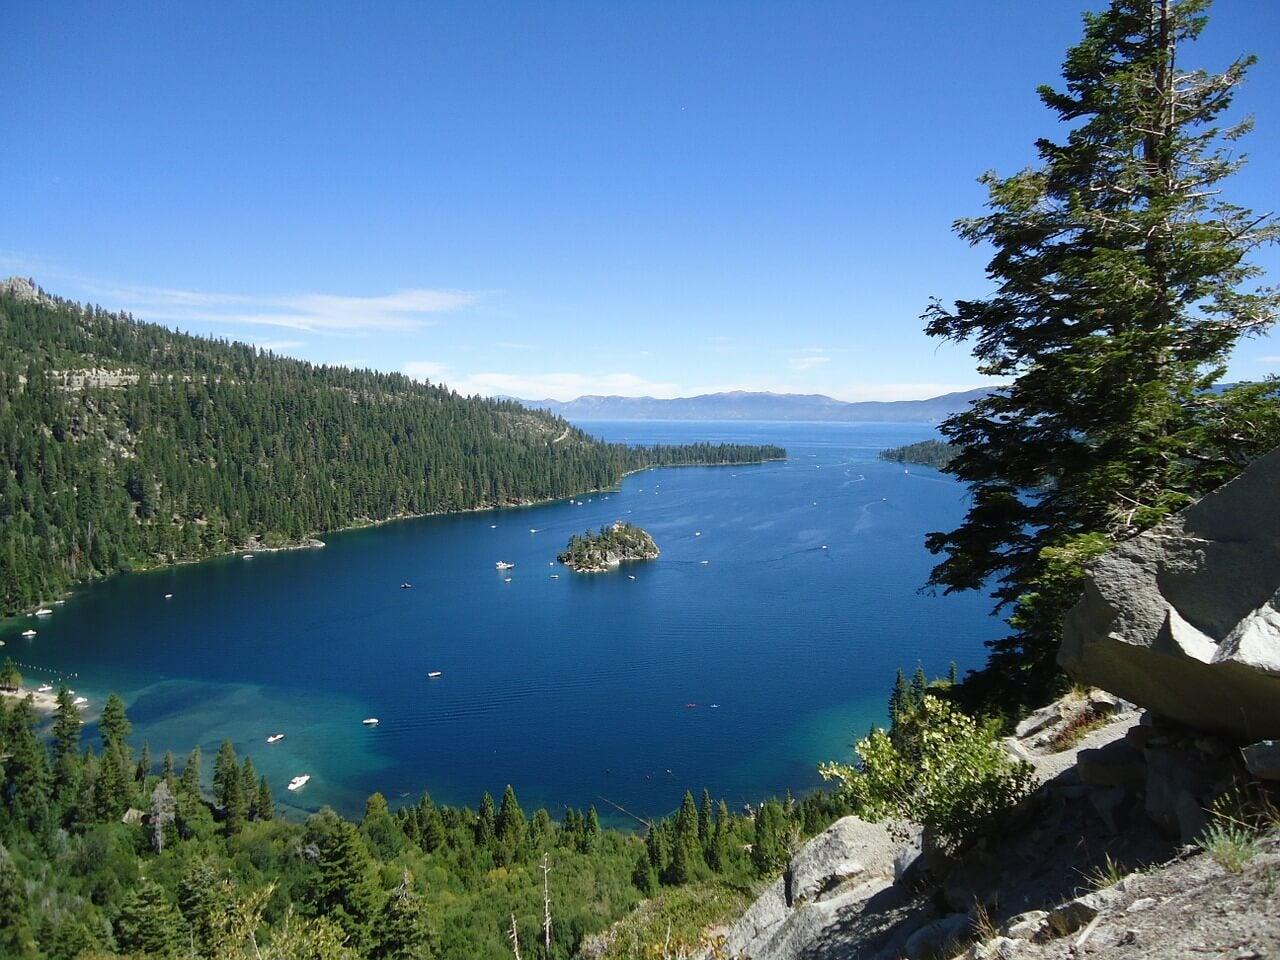 Vista de Emerald Bay